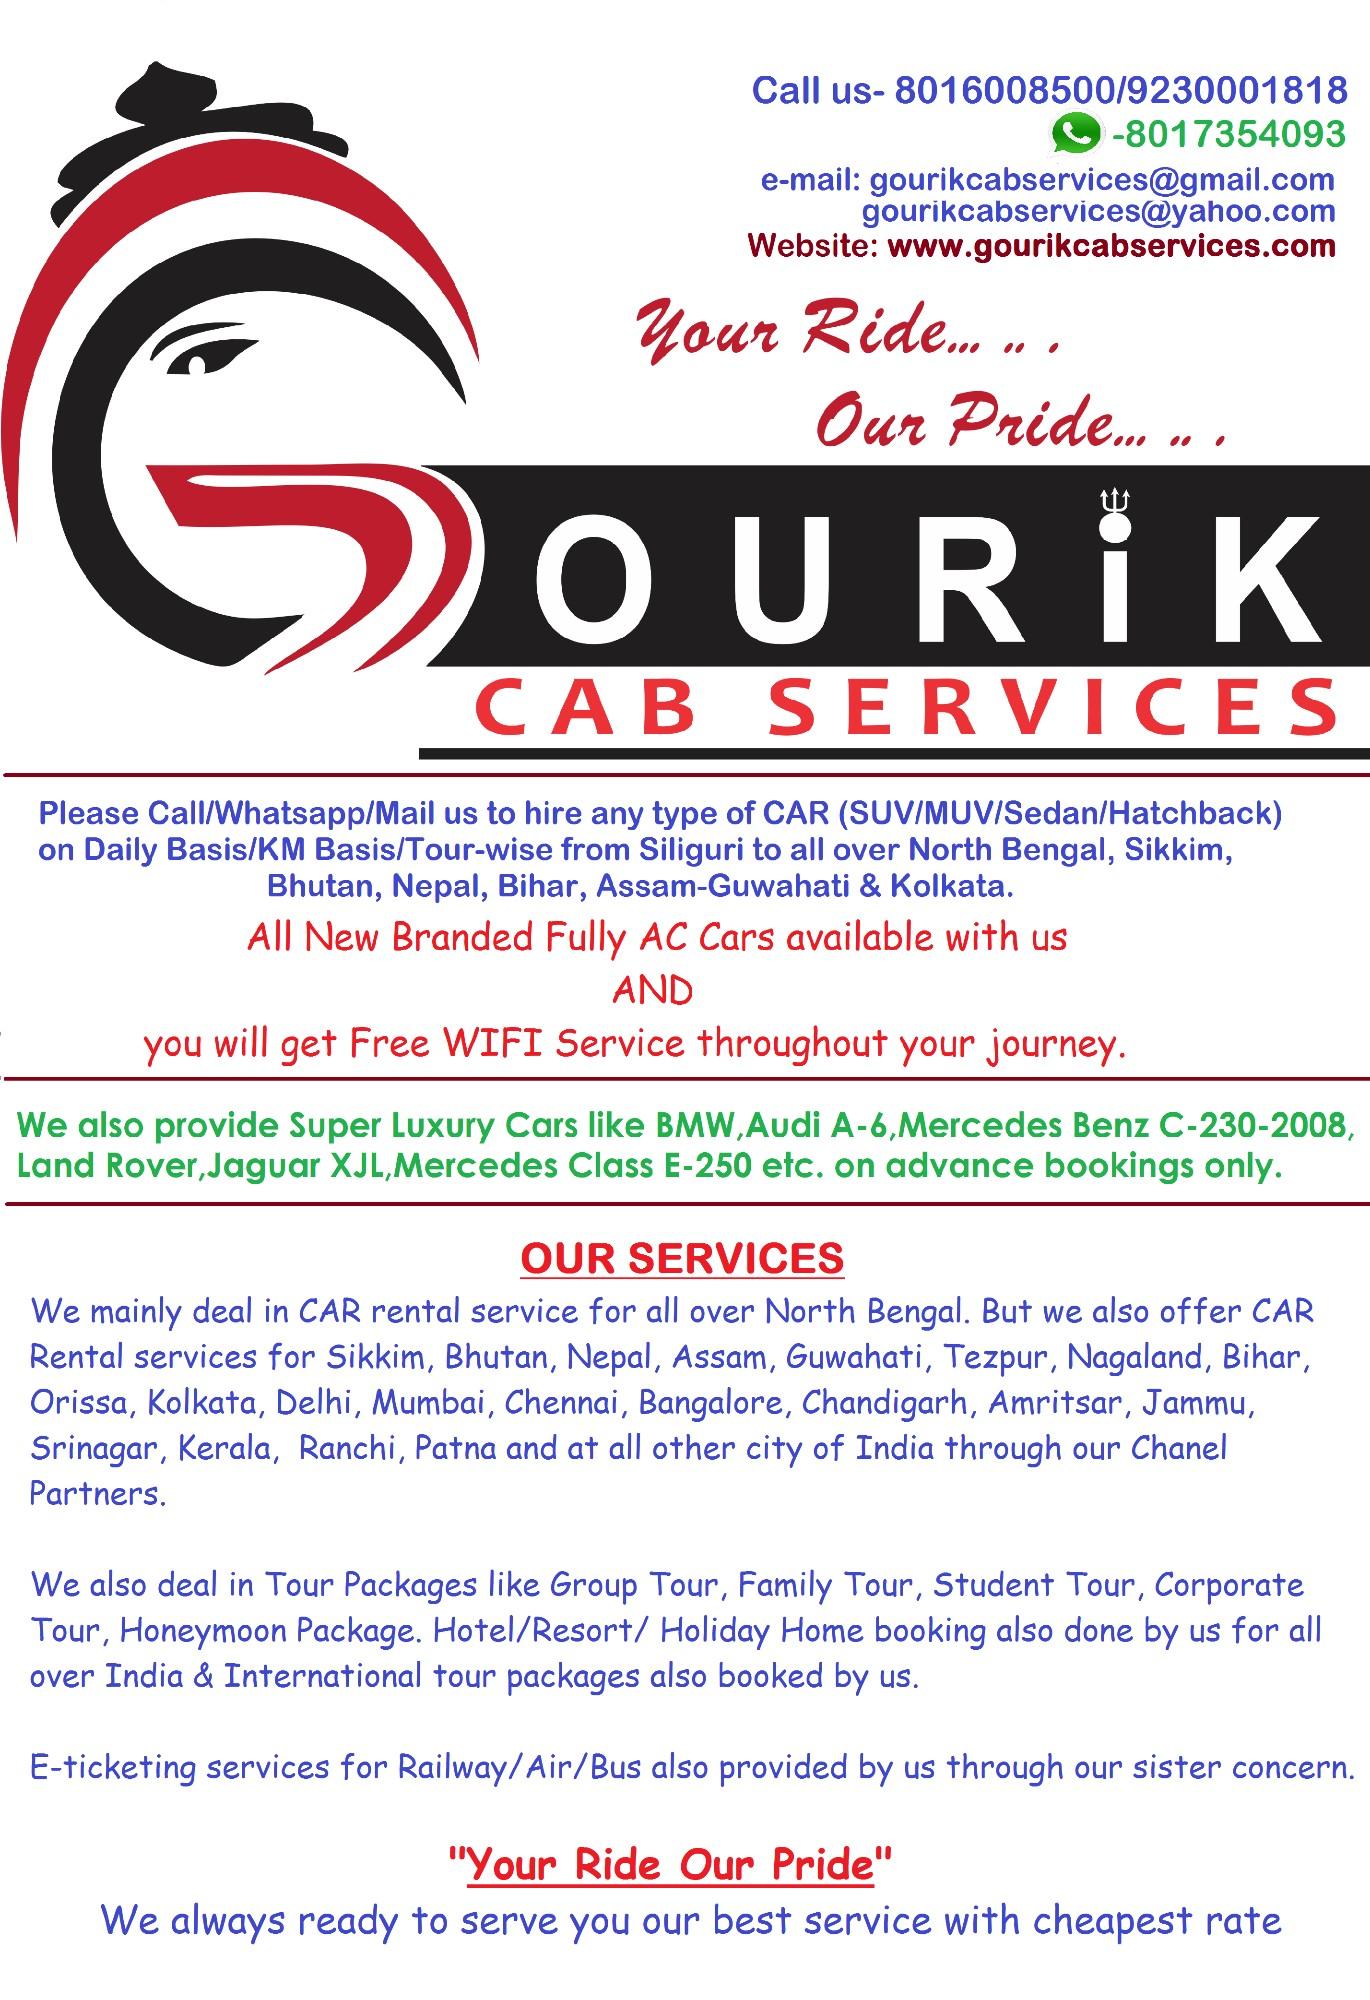 Gourik Cab Services - Deshbandhu Para, Siliguri, 734004 - Sulekha